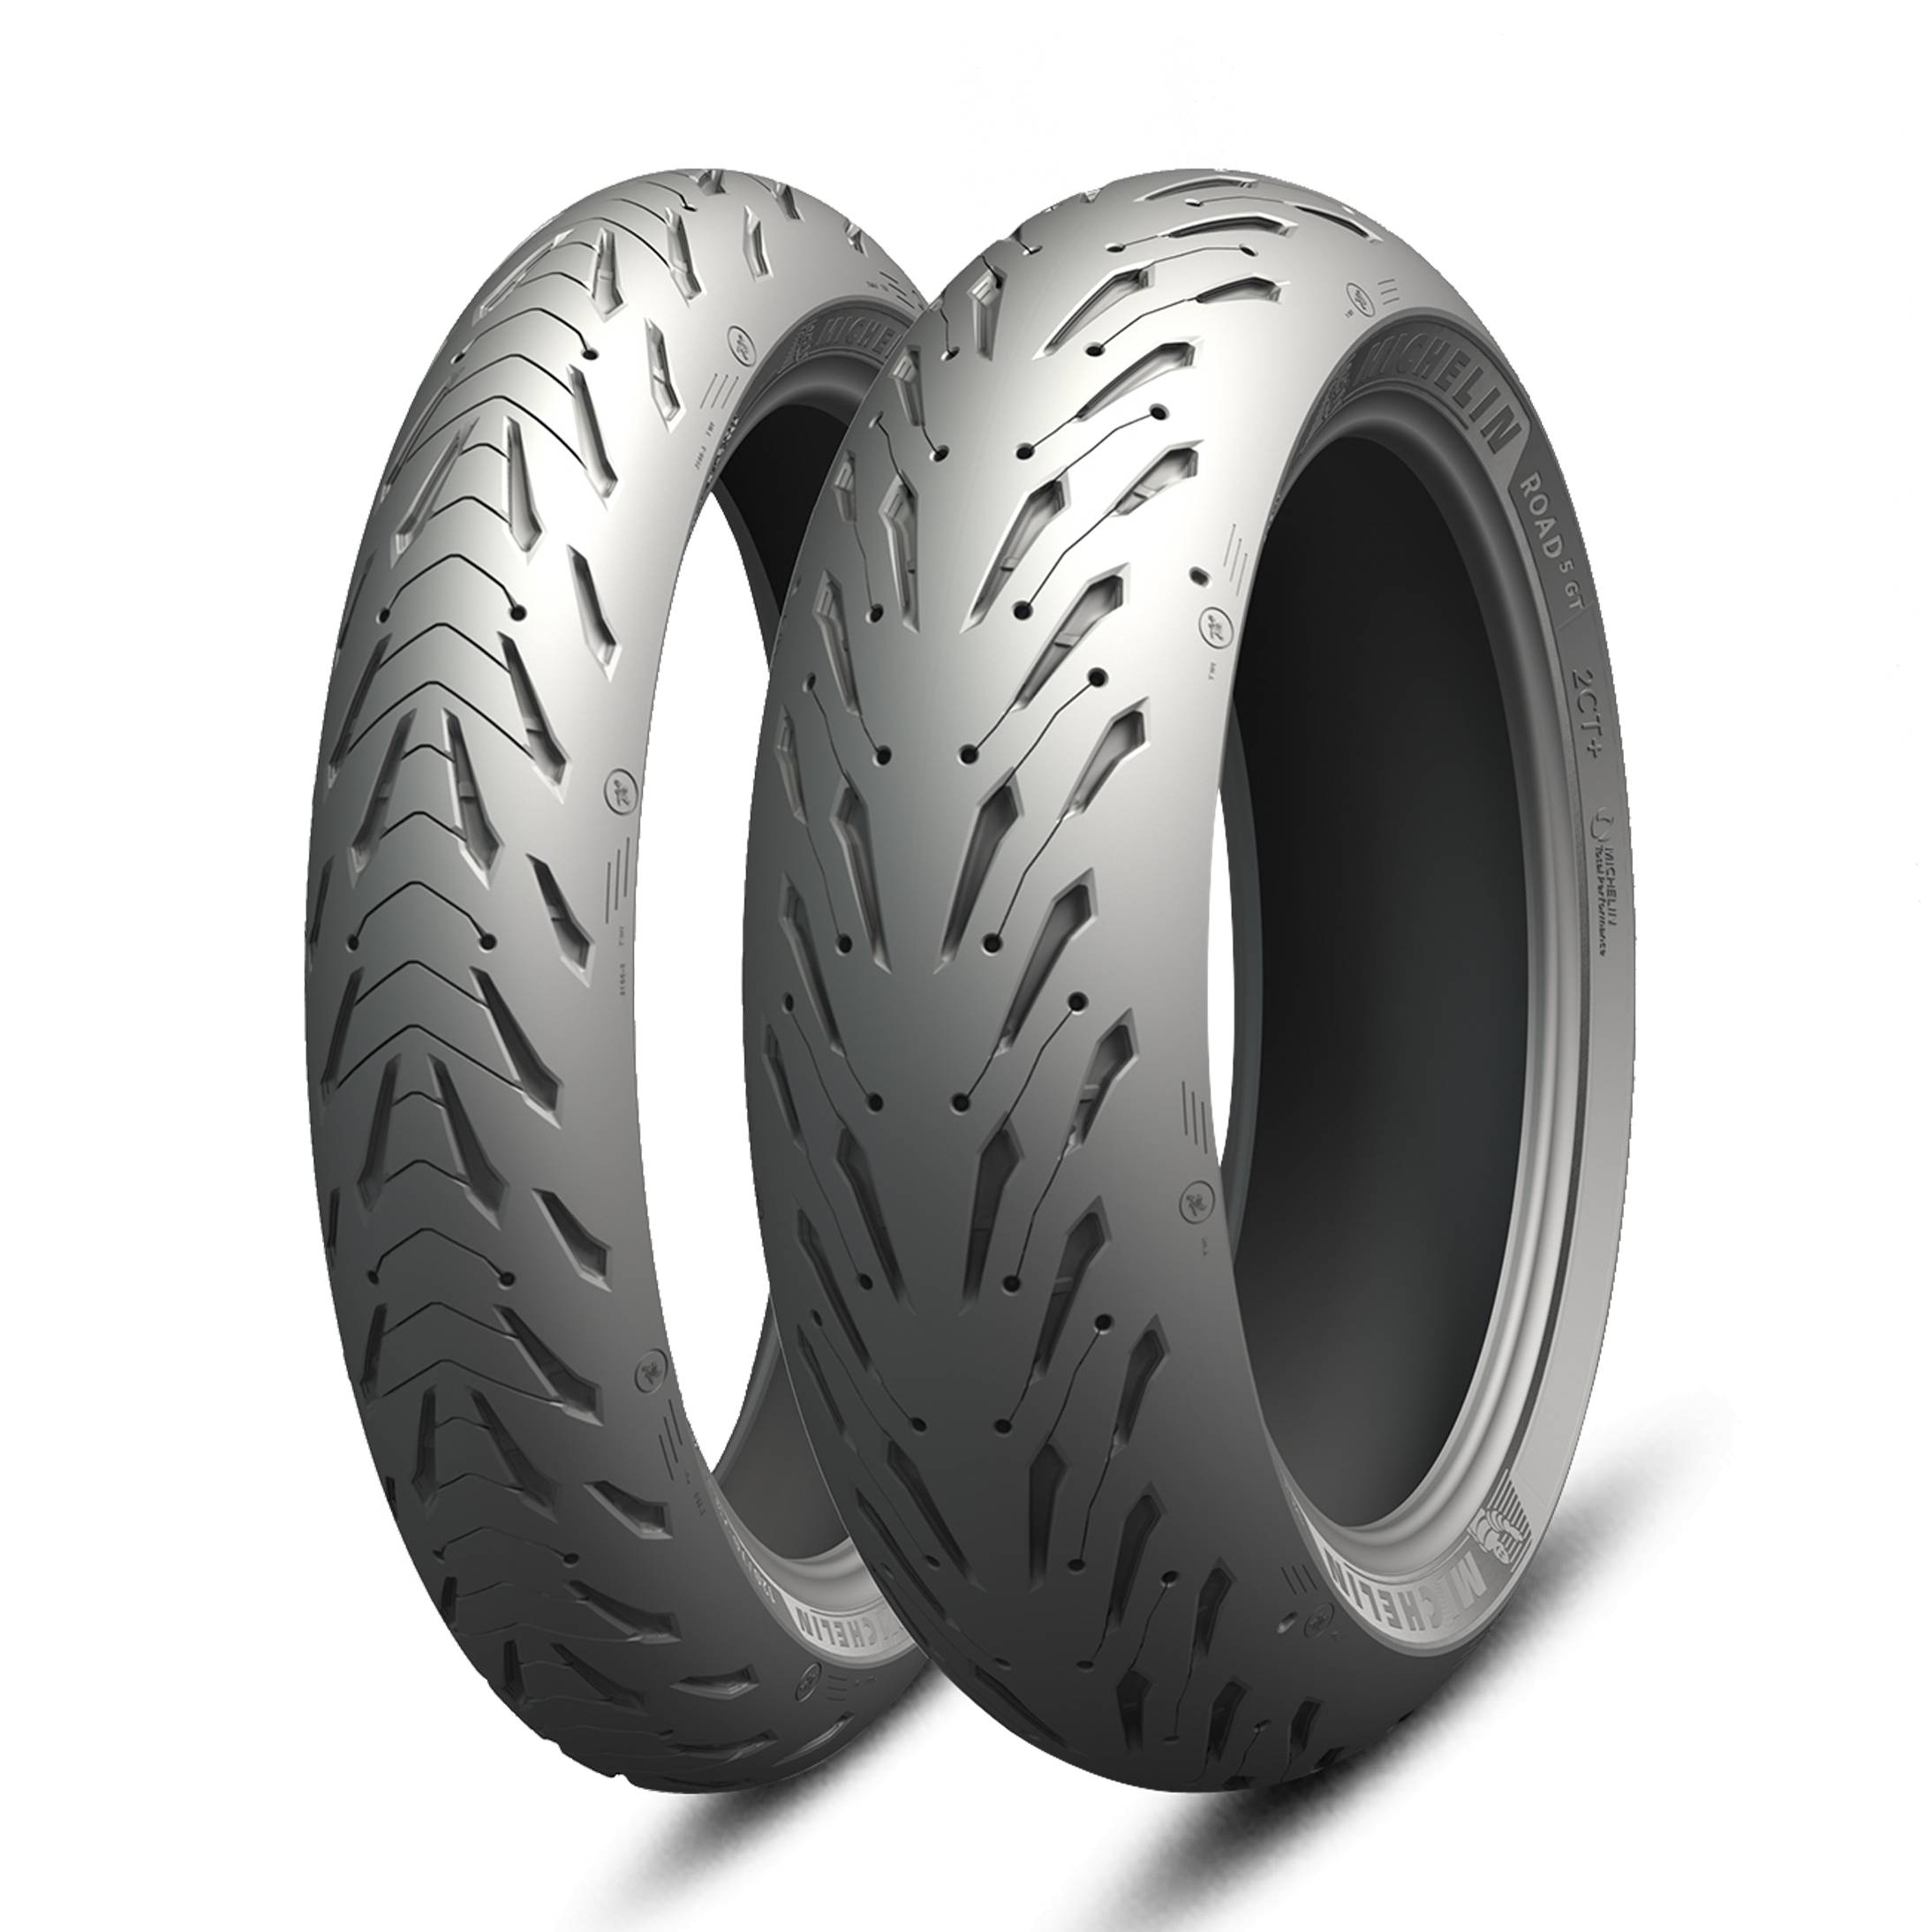 Michelin Pneu Avant Michelin Road 5 GT Touring